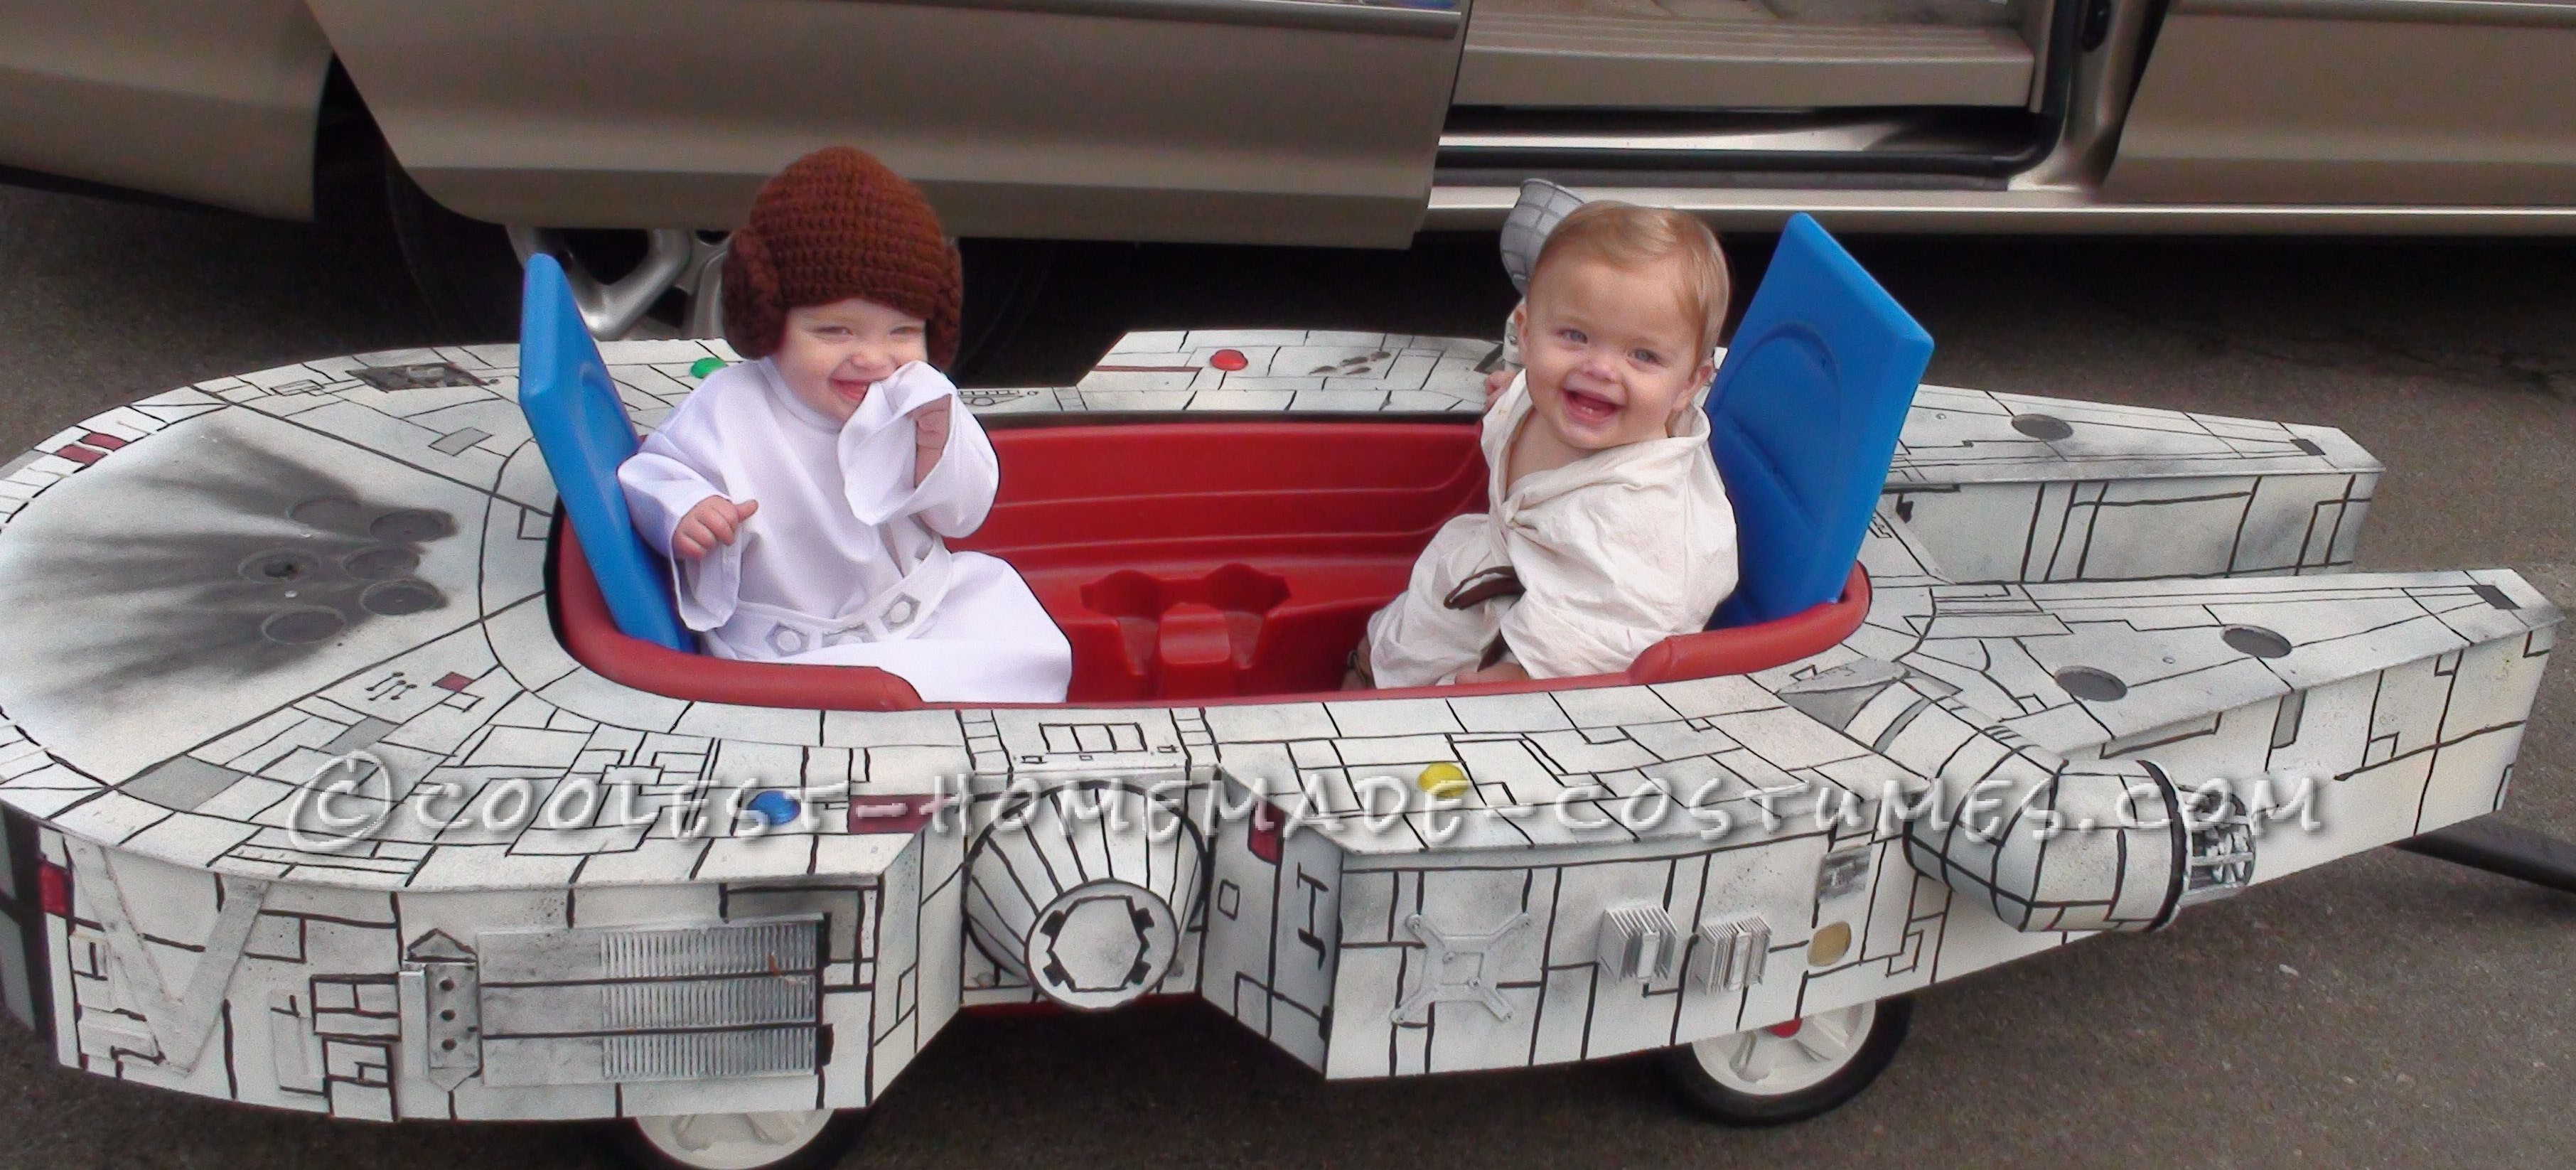 Infant Boy-Girl Twins Millennium Flyer Halloween Costume